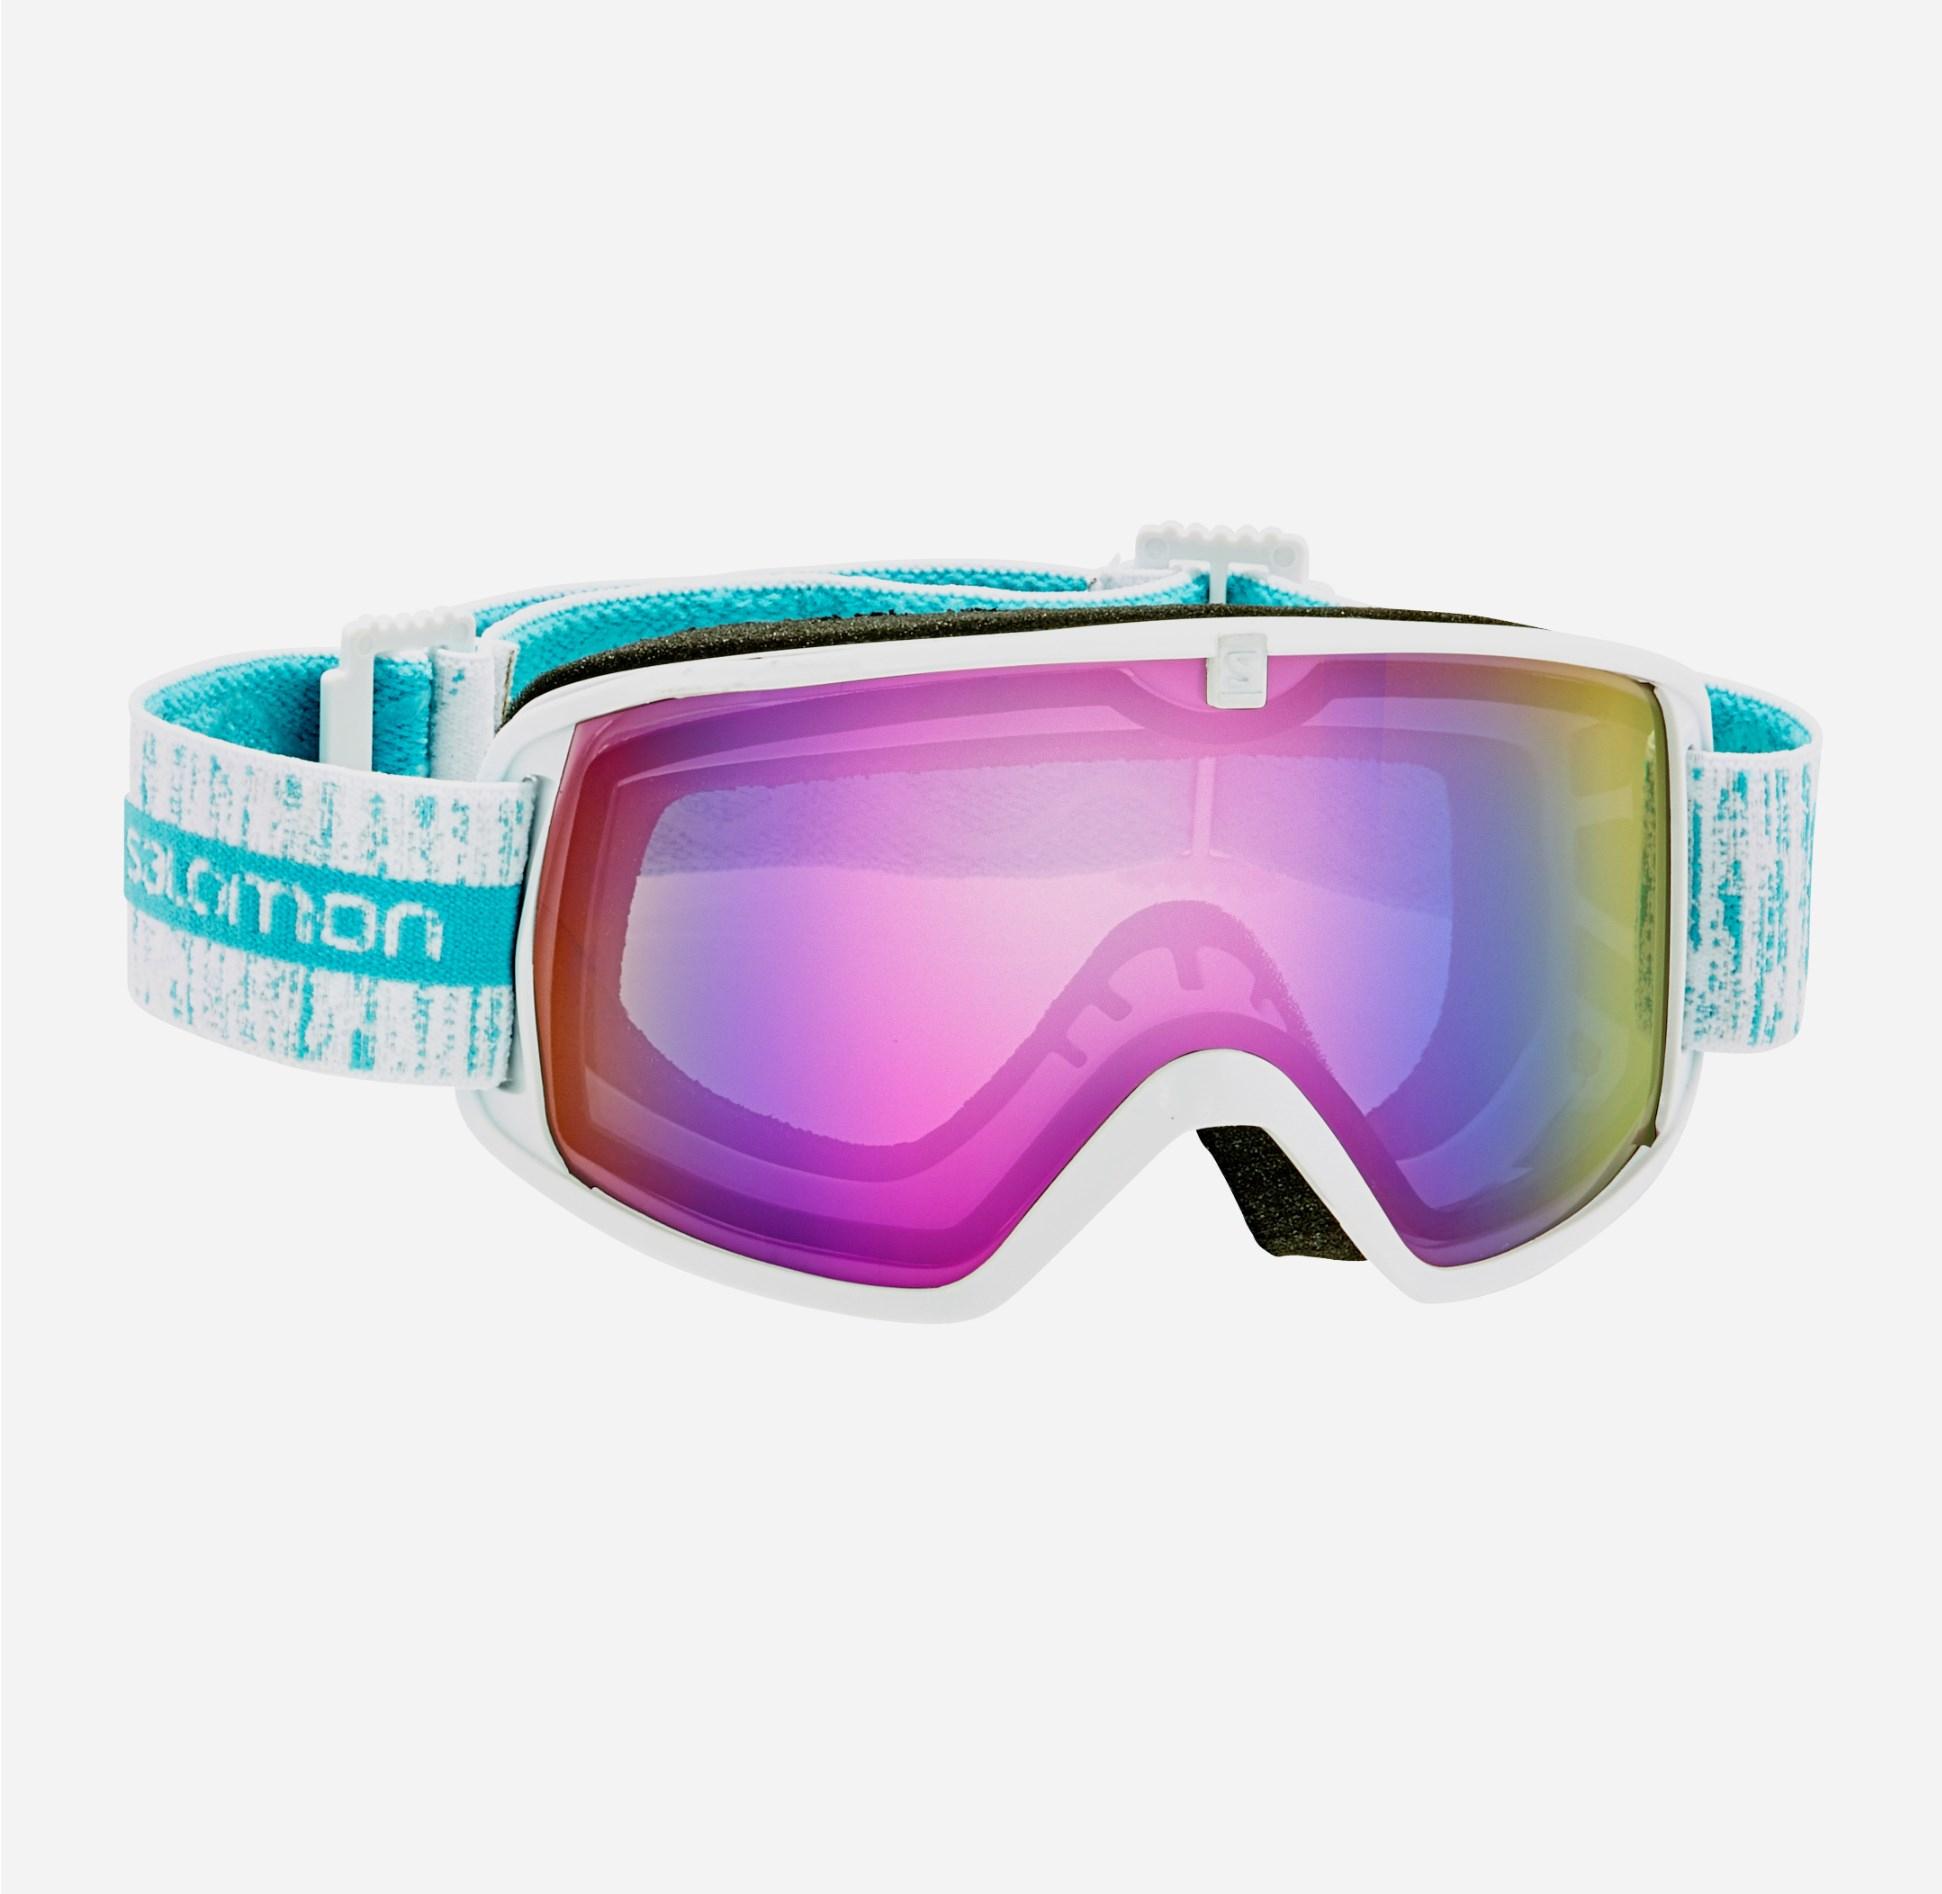 Masque de ski adulte Force ML-Salomon